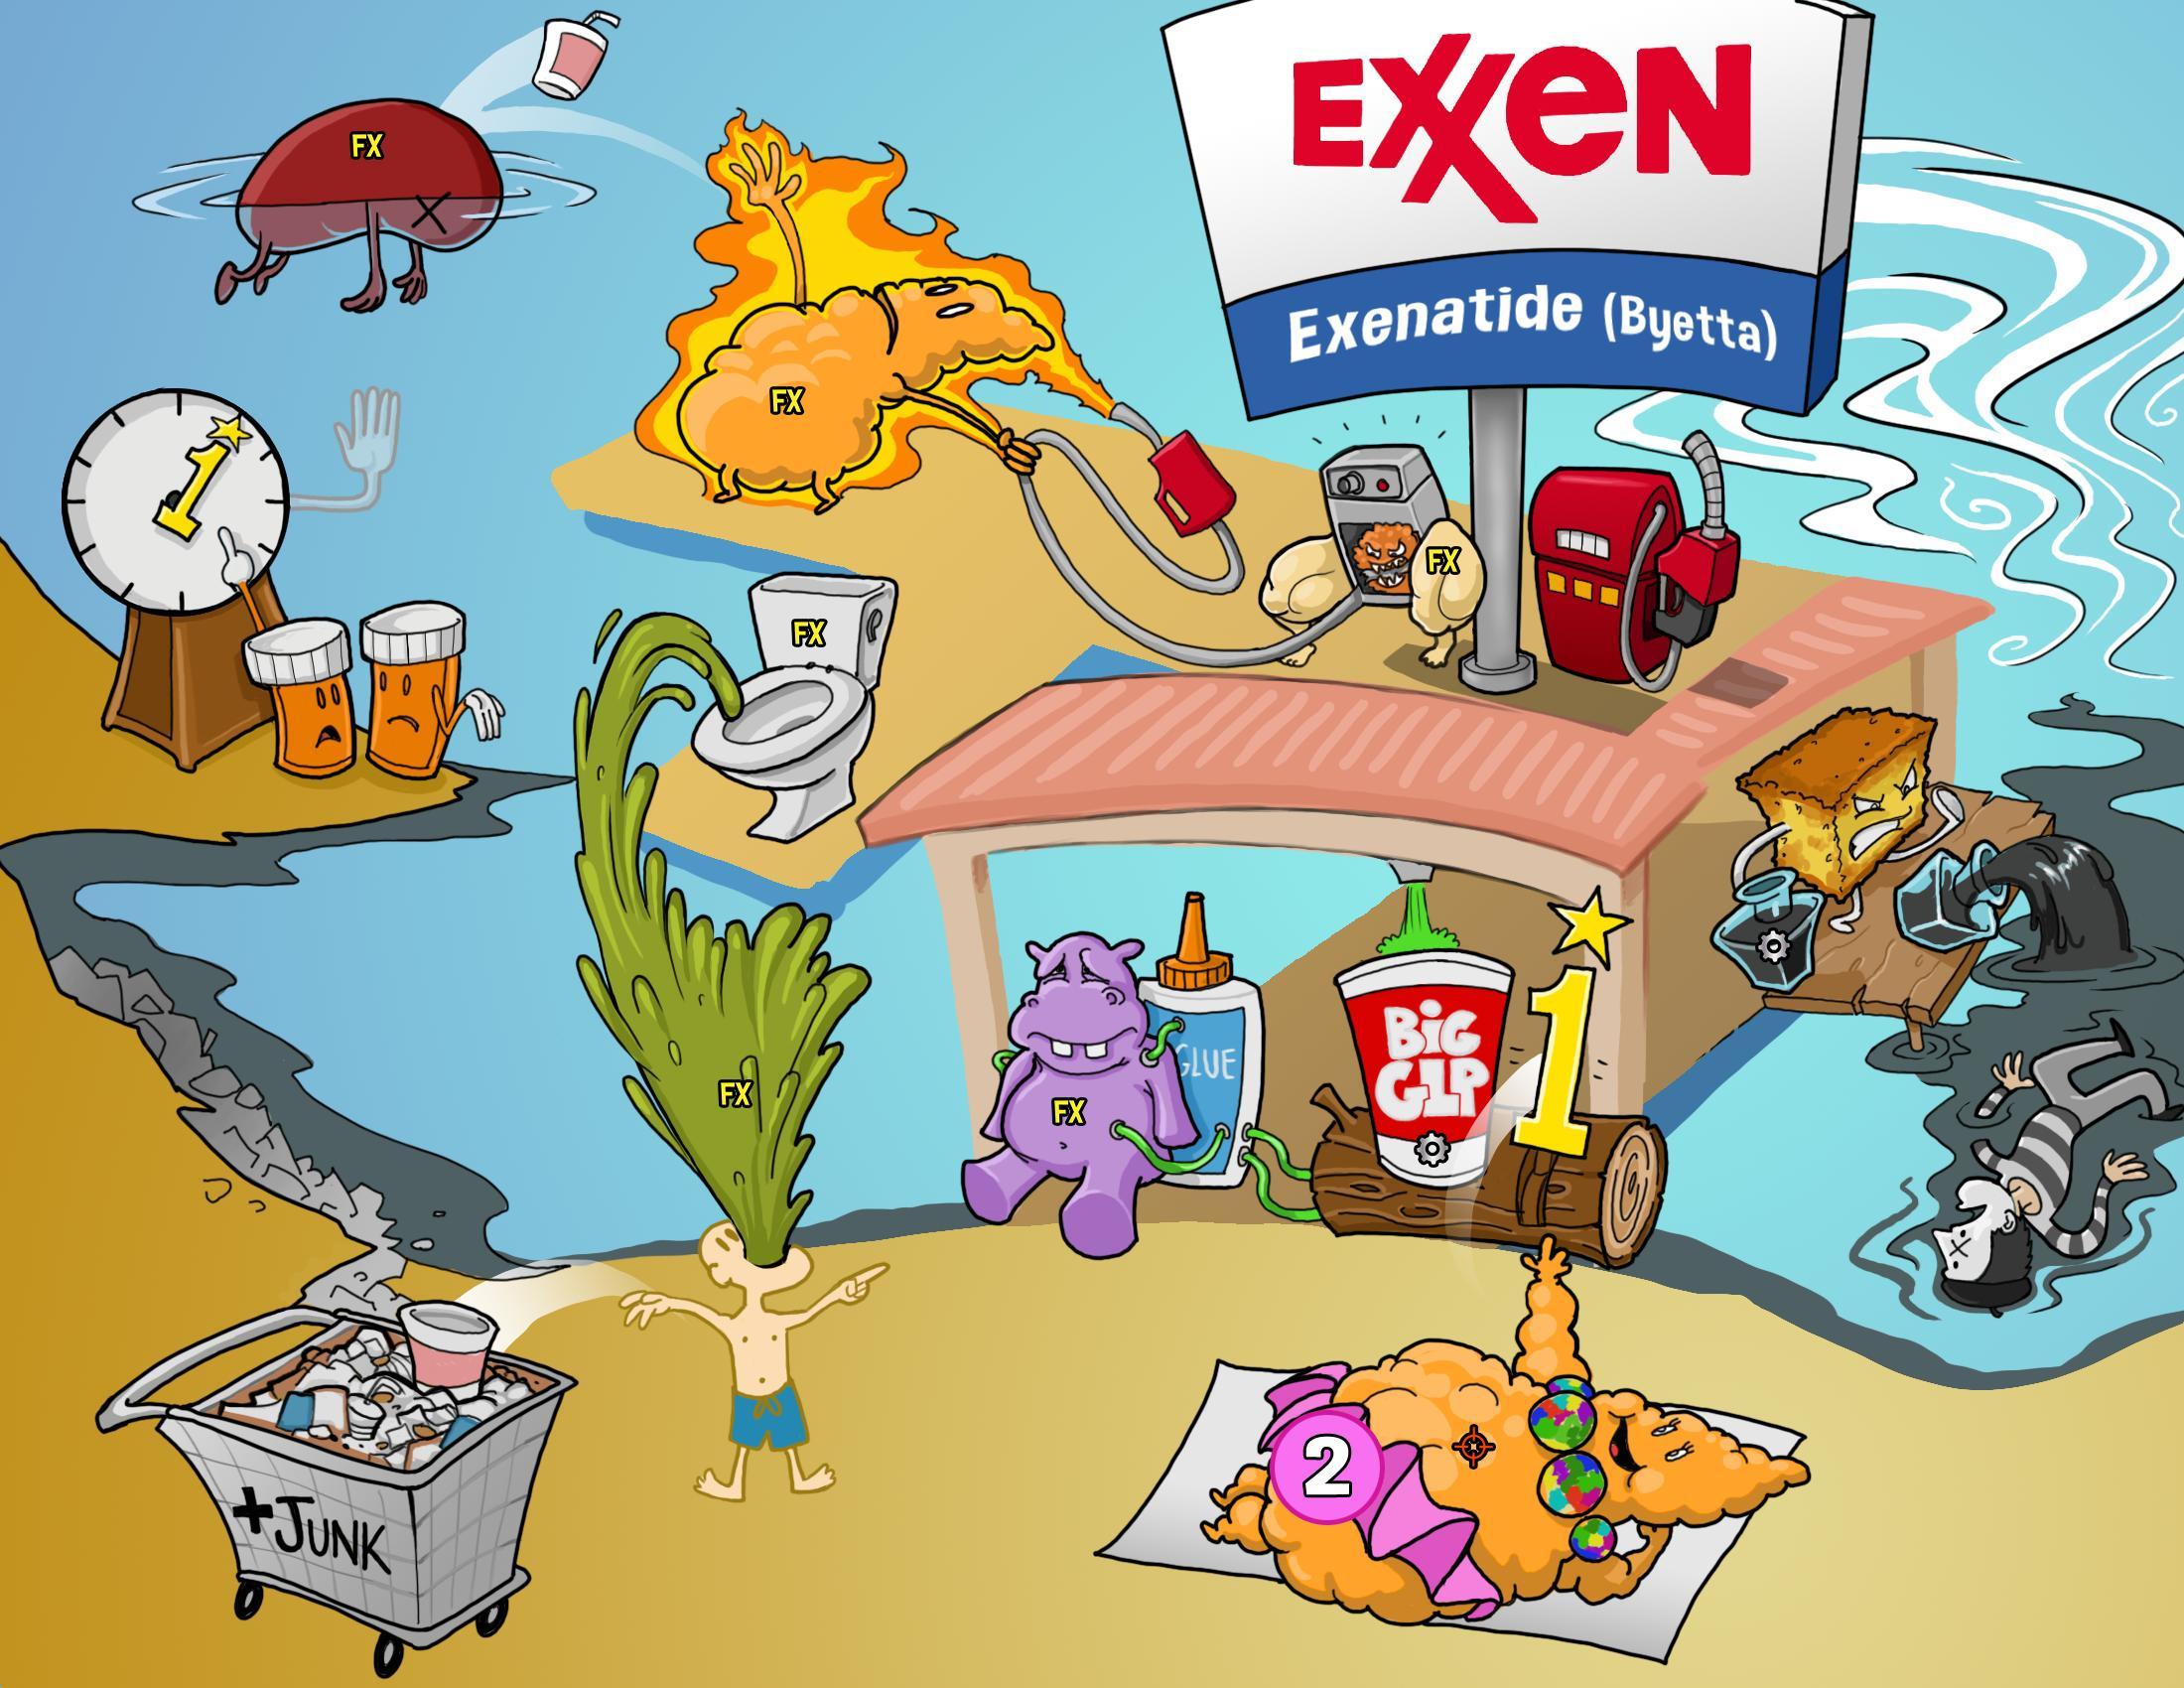 Exenatide (Byetta)